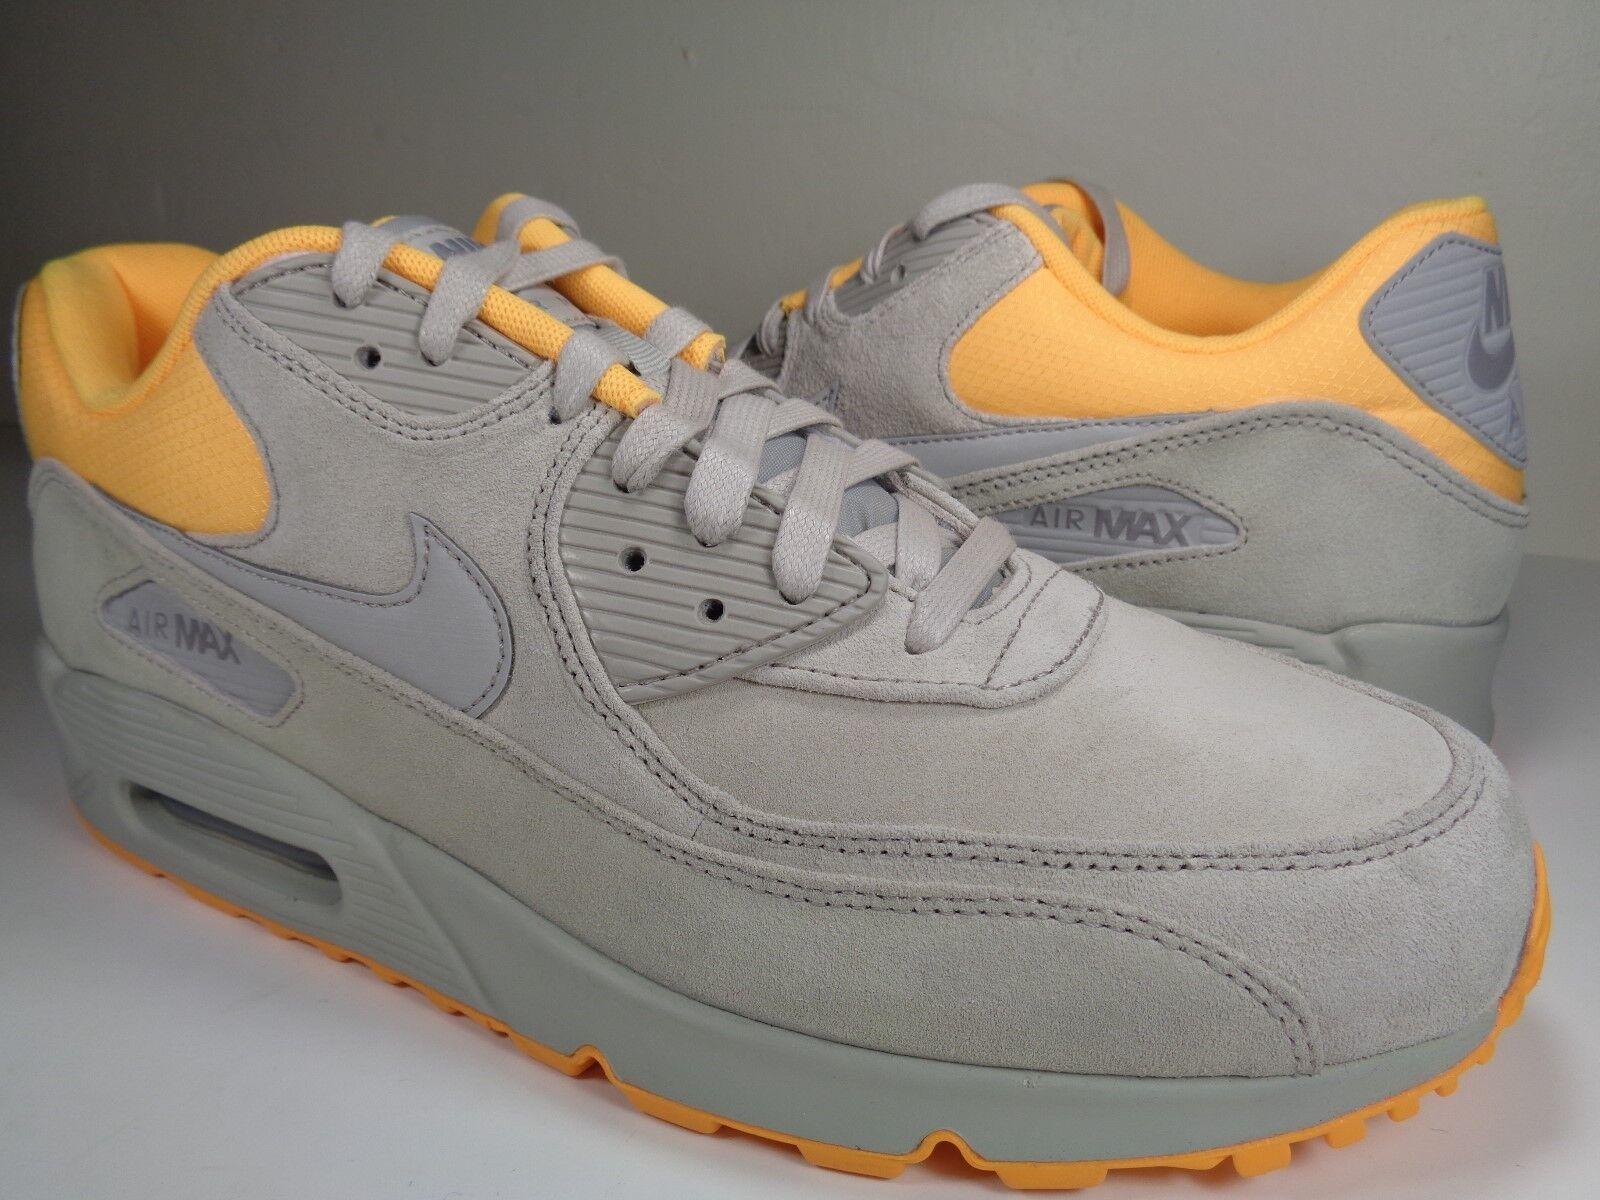 Nike Air Max 90 Premium Pale Grey Laser Orange Yellow Rare SZ 11 (333888-028)